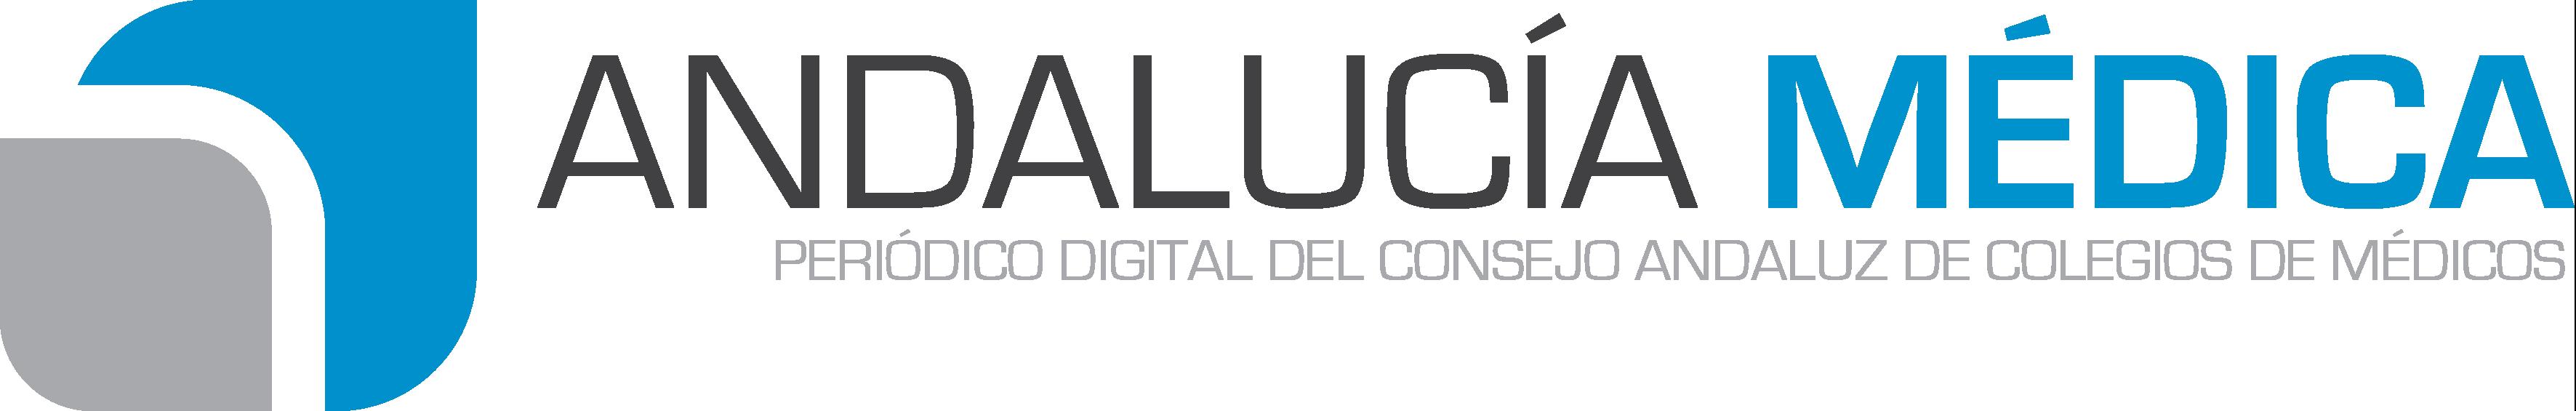 Andalucia Médica. Periódico digital del CACM